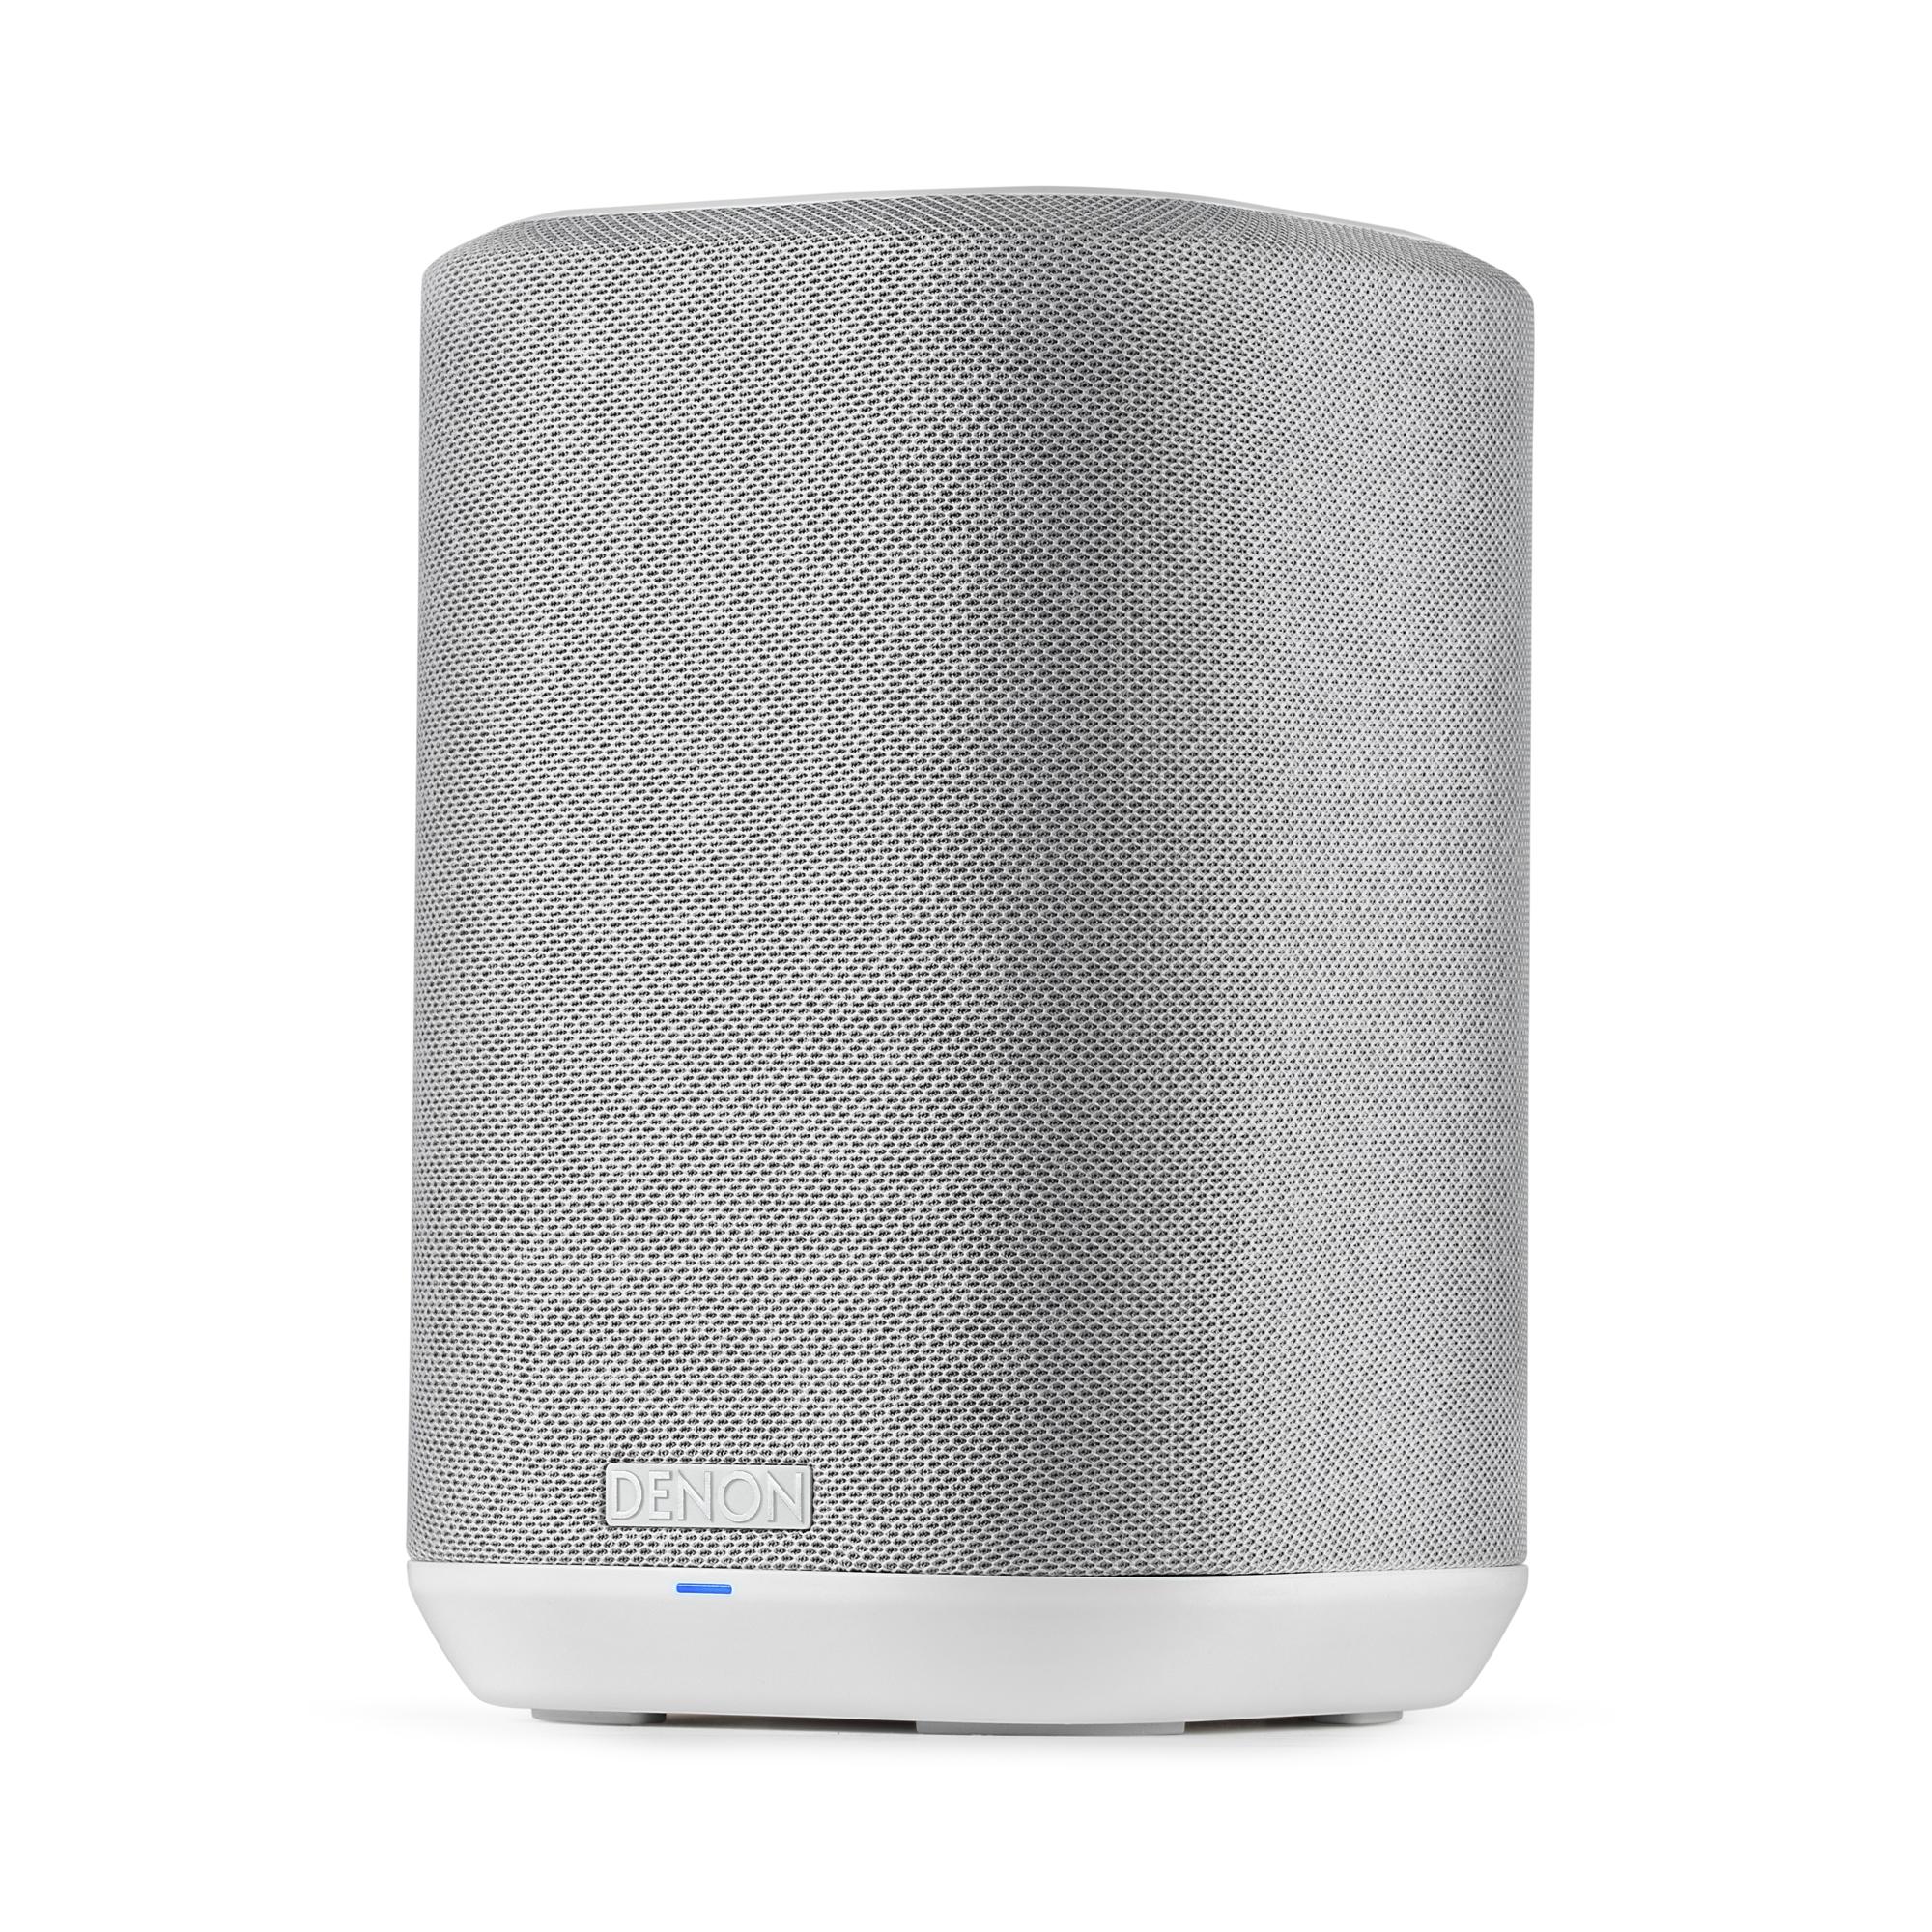 Denon Home 150 weiss Stück Wireless-Lautsprecher 101148